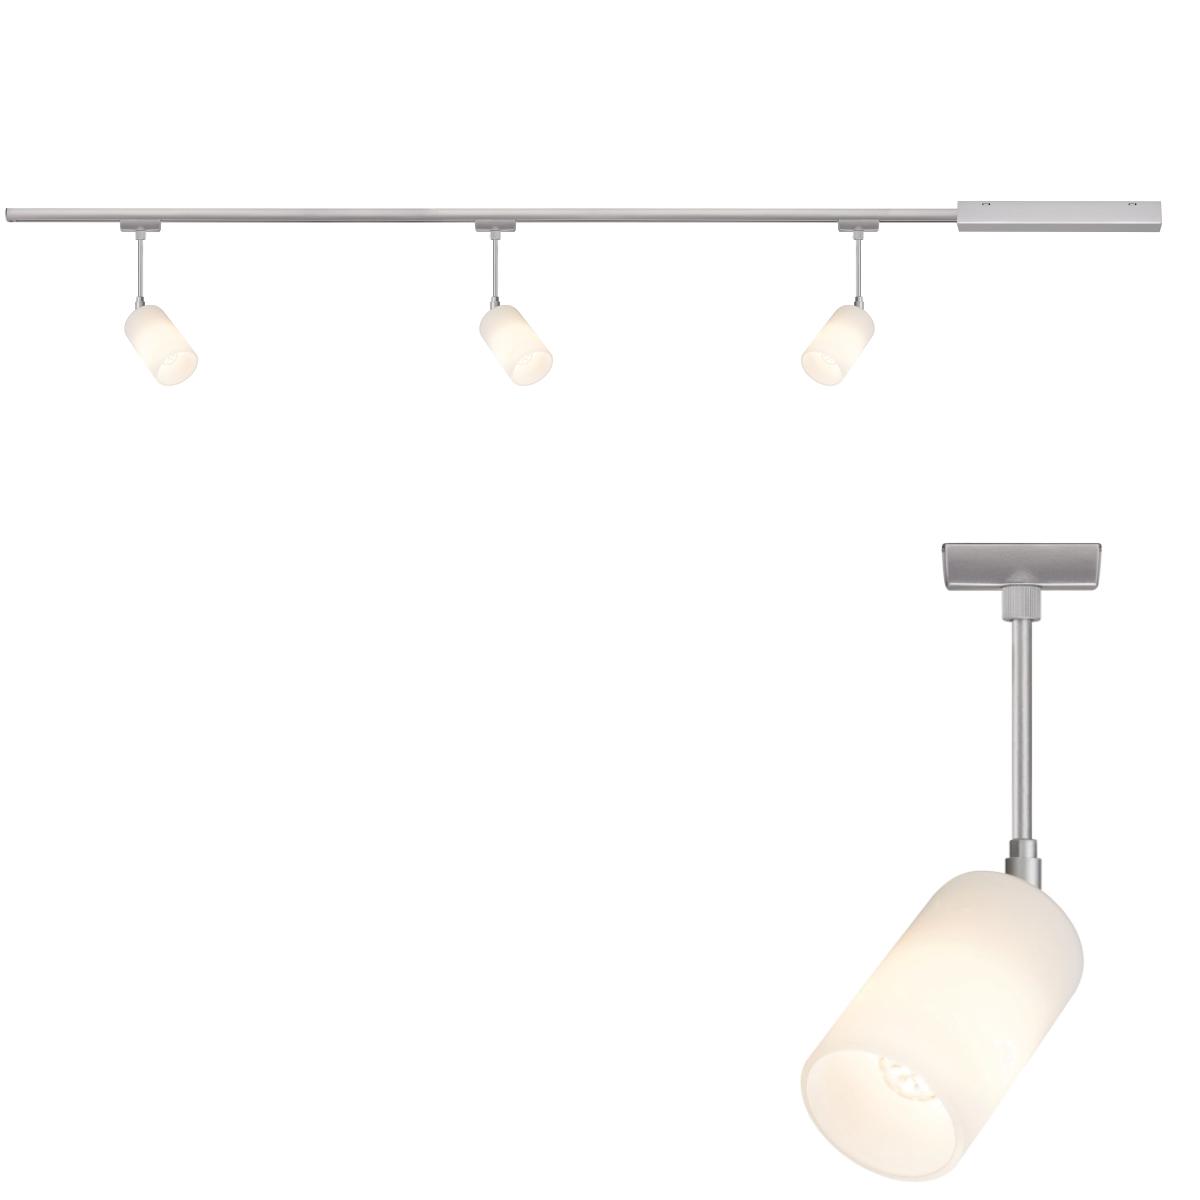 Paulmann URail Beleuchtung ➤ Schienensystem Planungshilfe